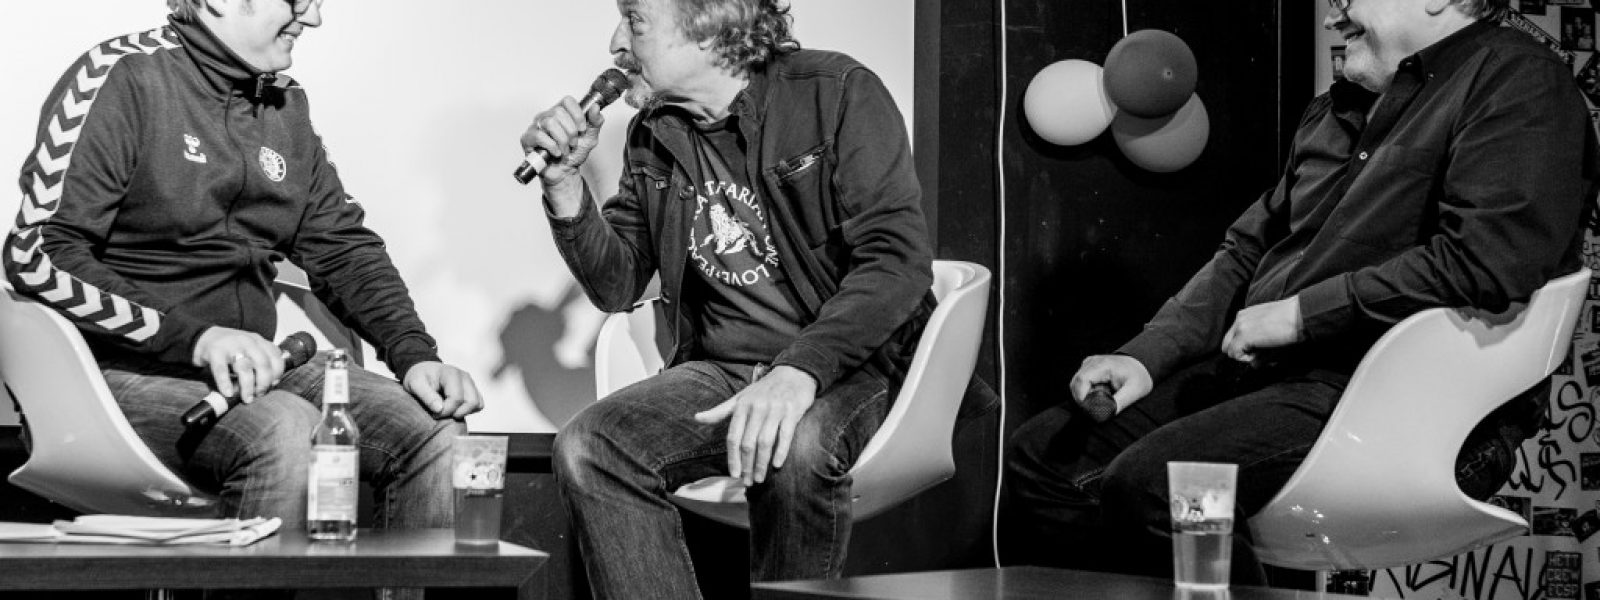 05 Christoph Nagel, Wolfgang Niedecken, Stuart Dykes (Foto Sabrina Adeline Nagel SAH_8088)